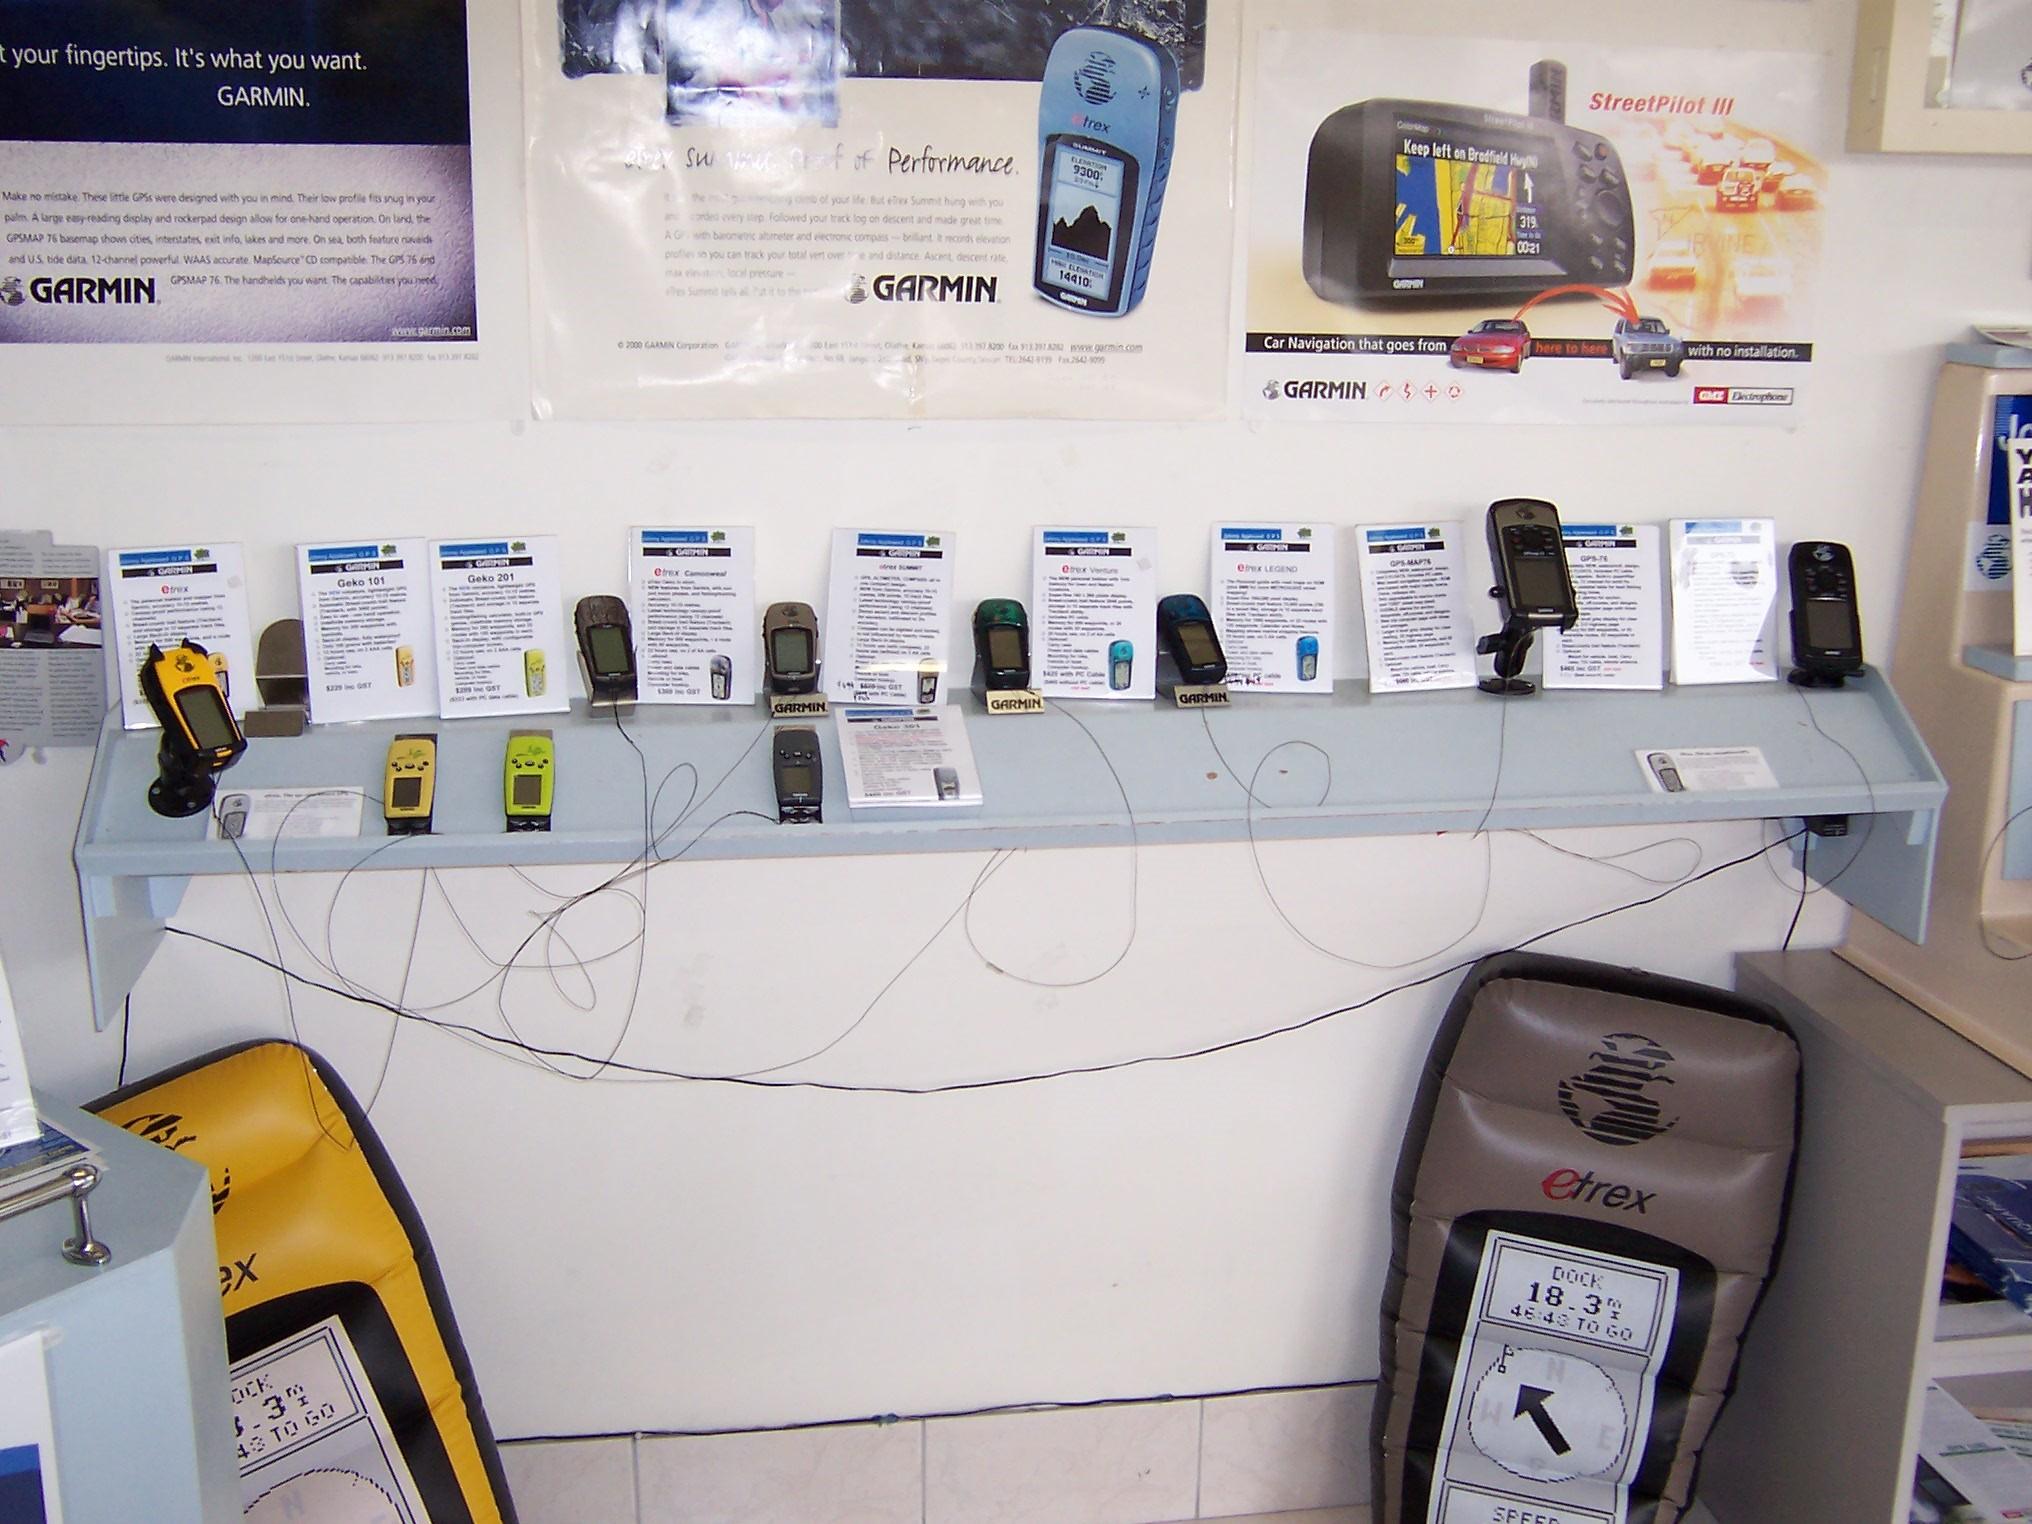 Early Garmin Handheld GPS